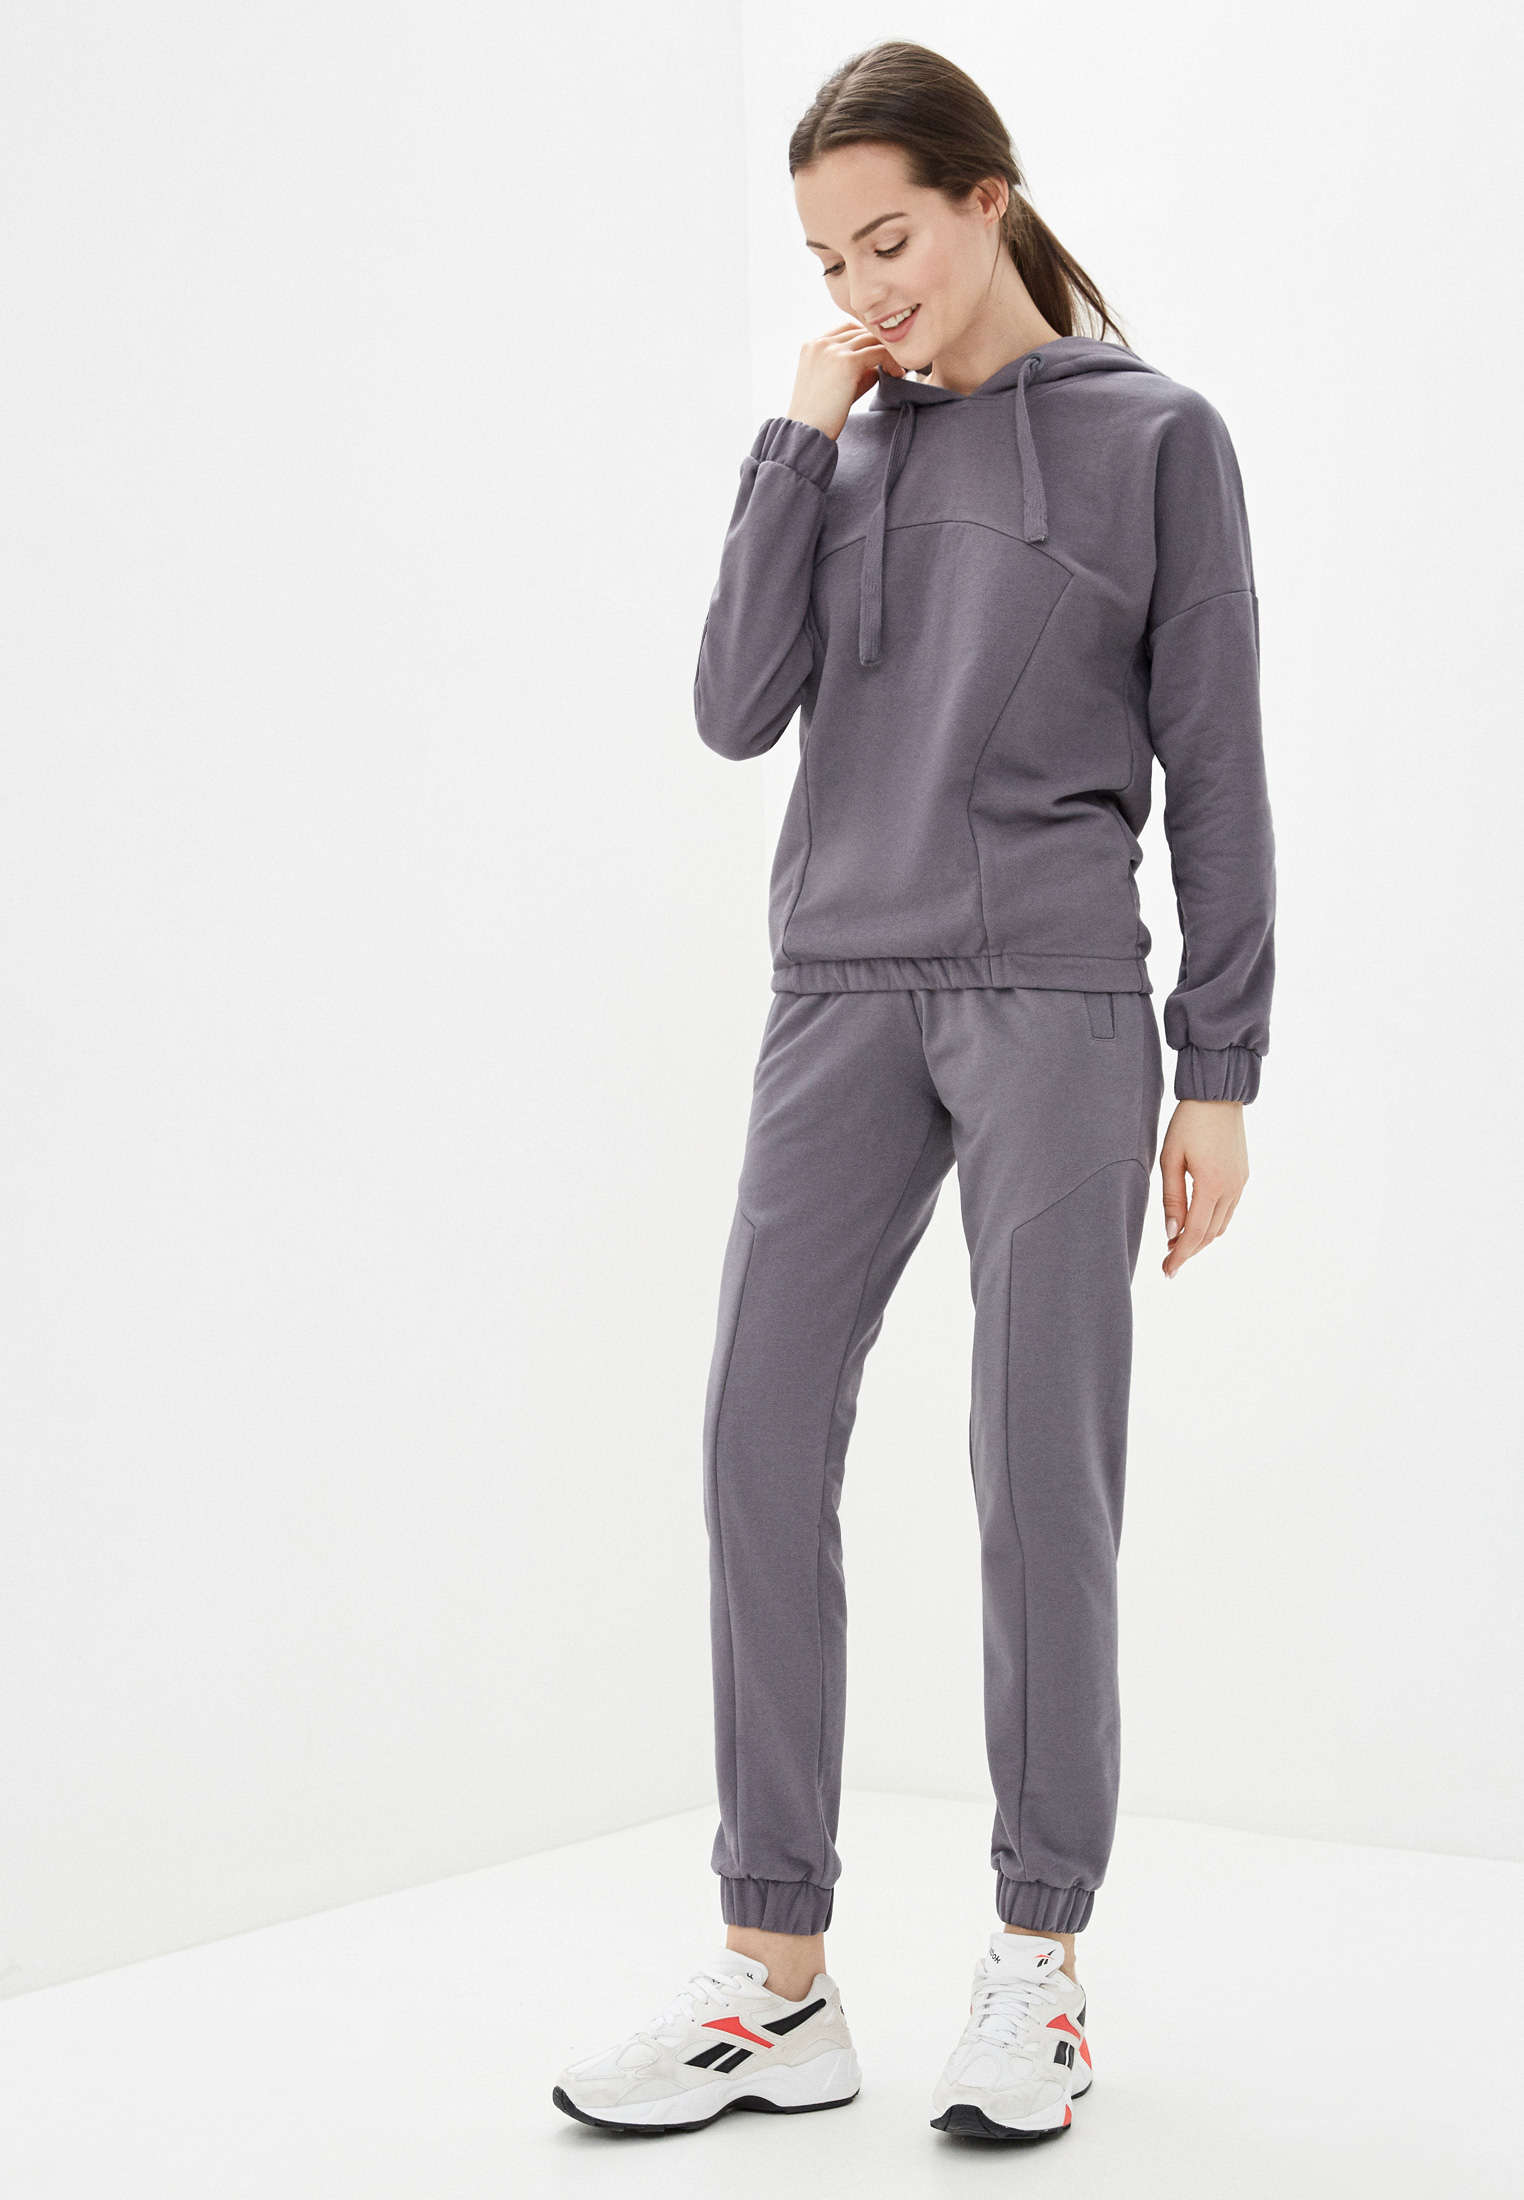 Спортивный костюм Sitlly 20315